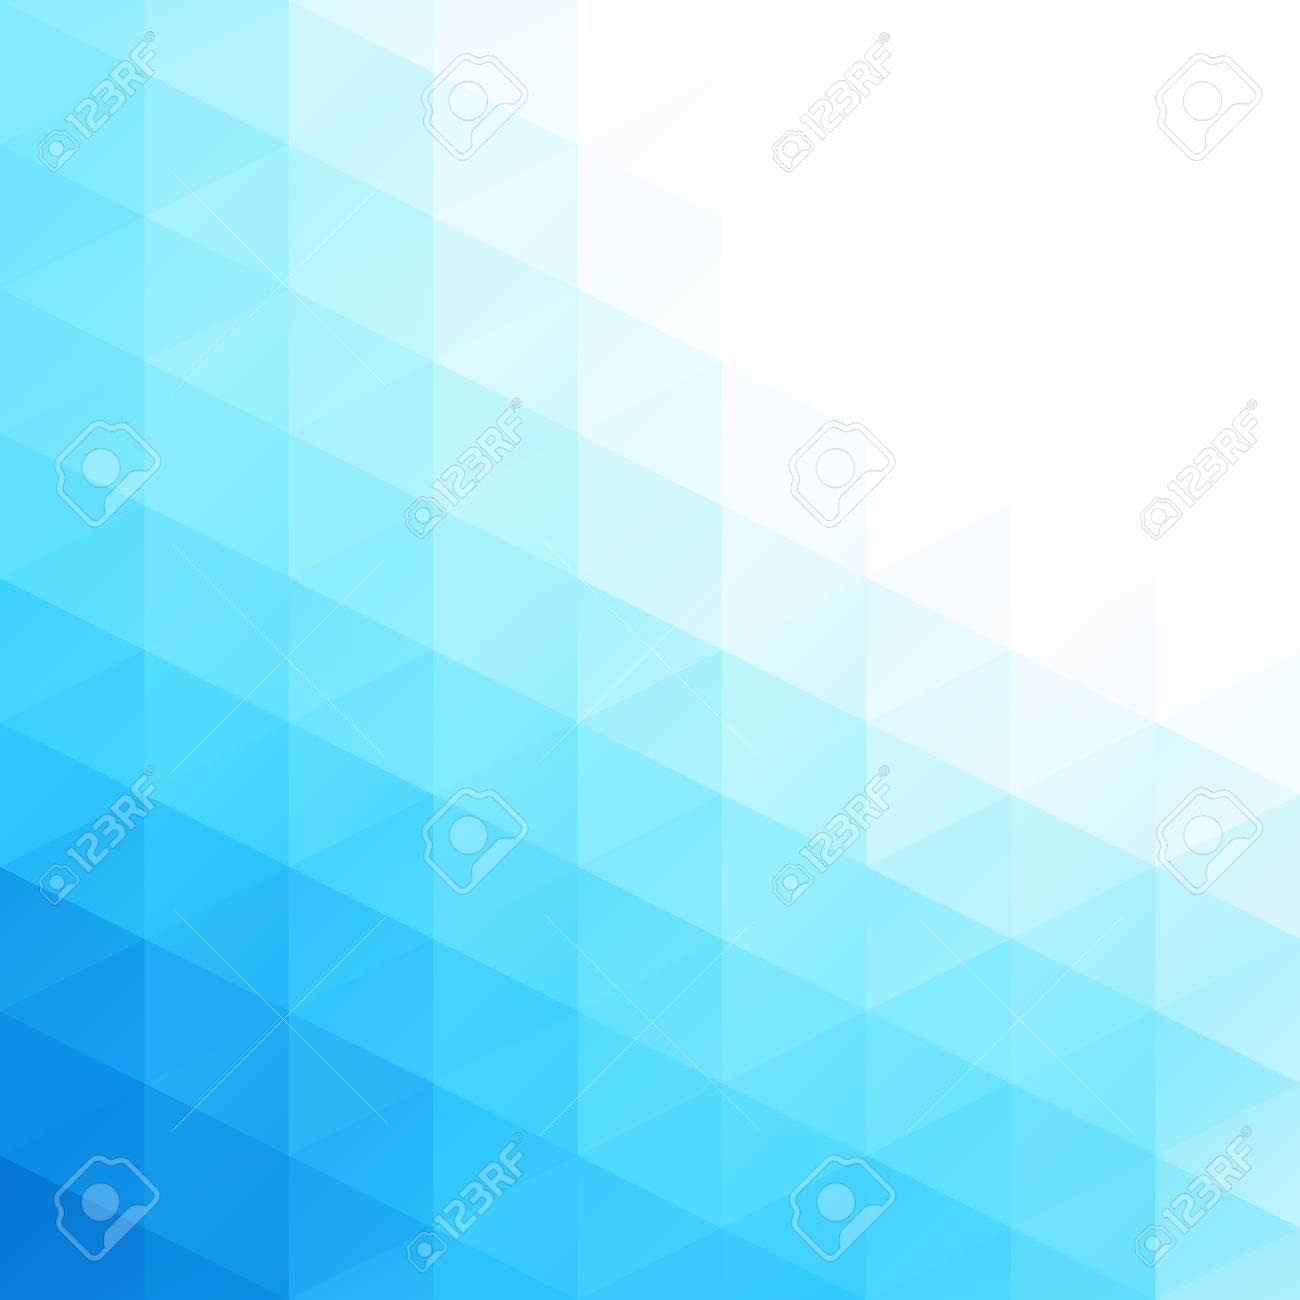 blue grid mosaic background creative design templates royalty free